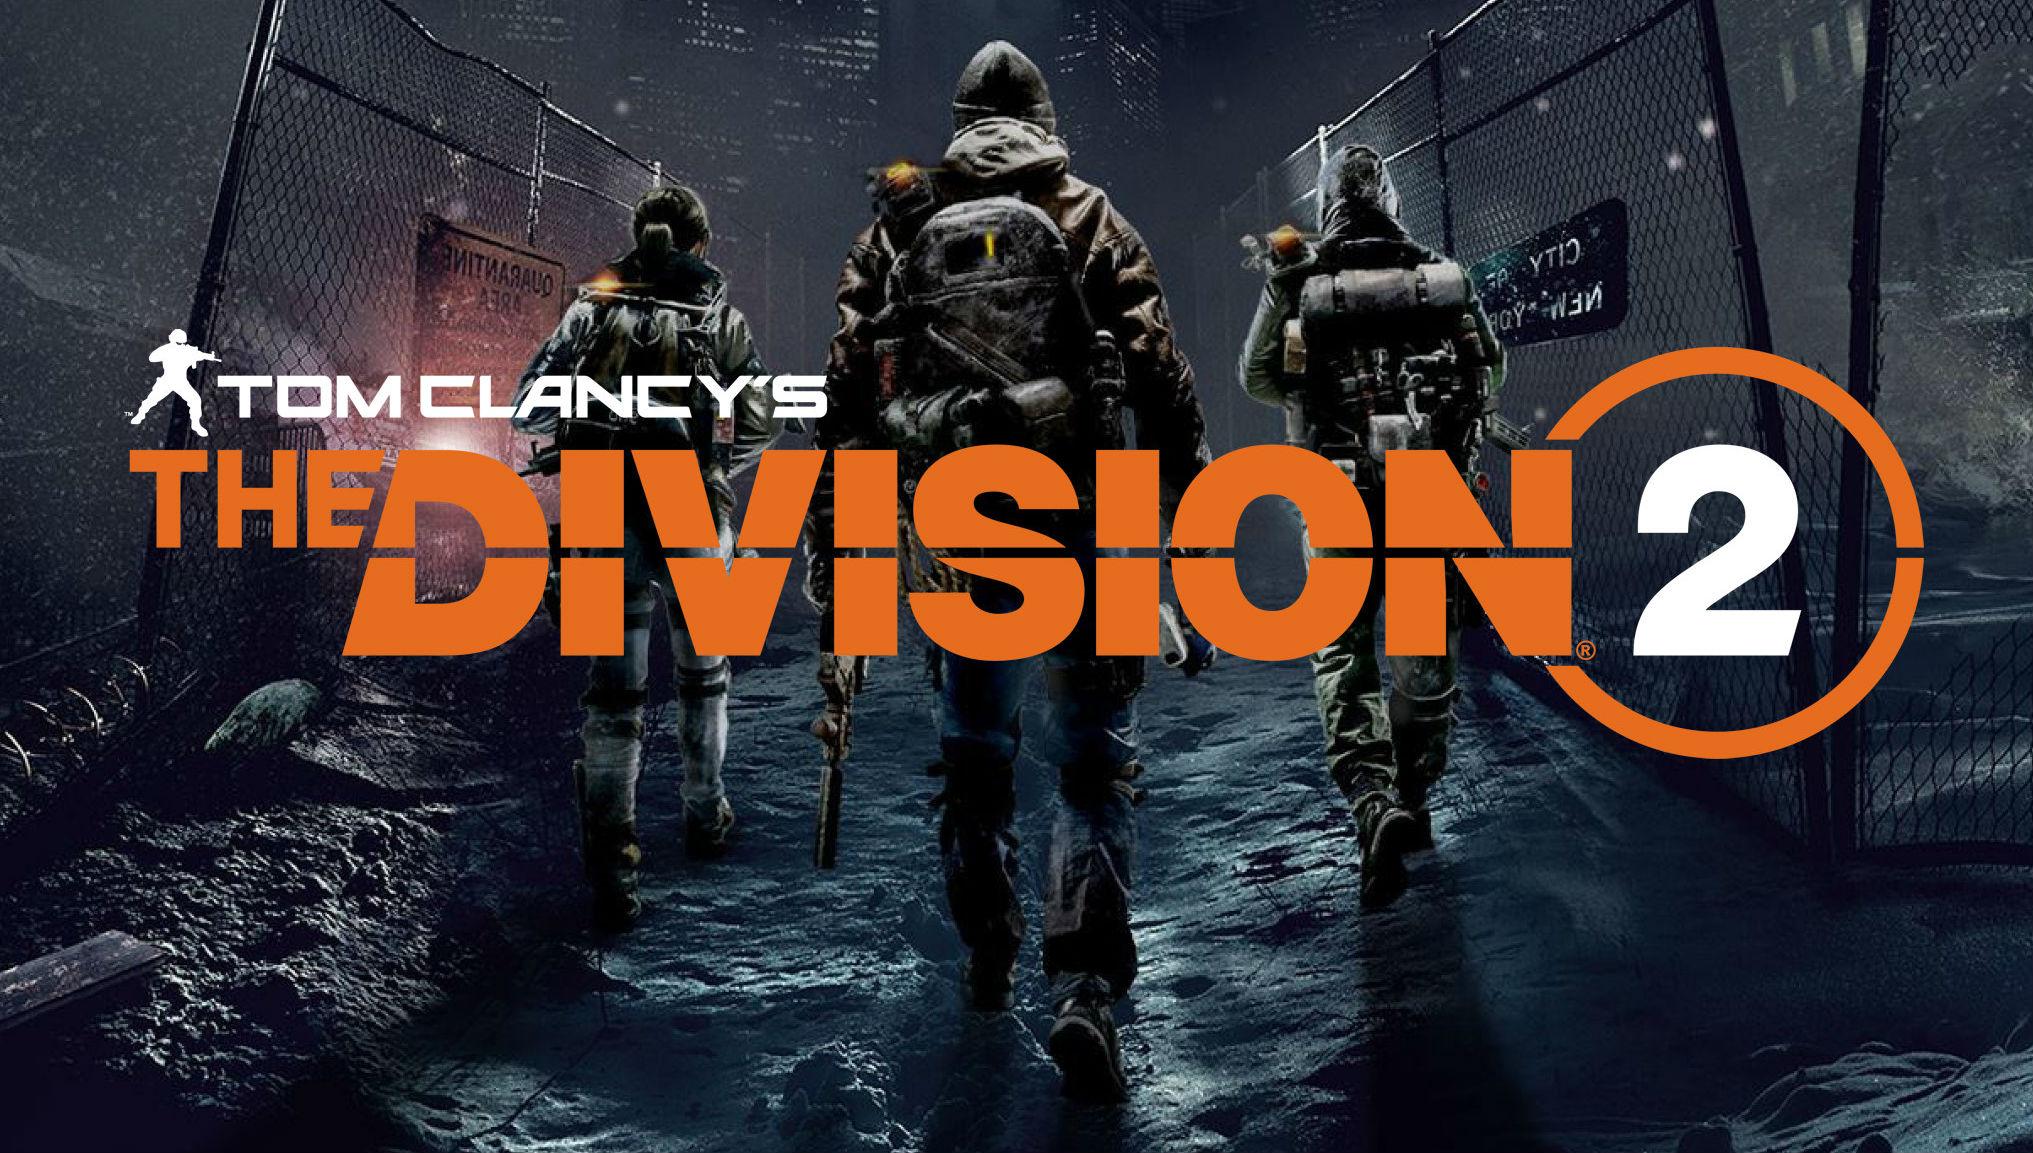 Tom Clancys The Division 2 เผยสเปคคอมออกมาแล้วว่าต้องการแบบไหน